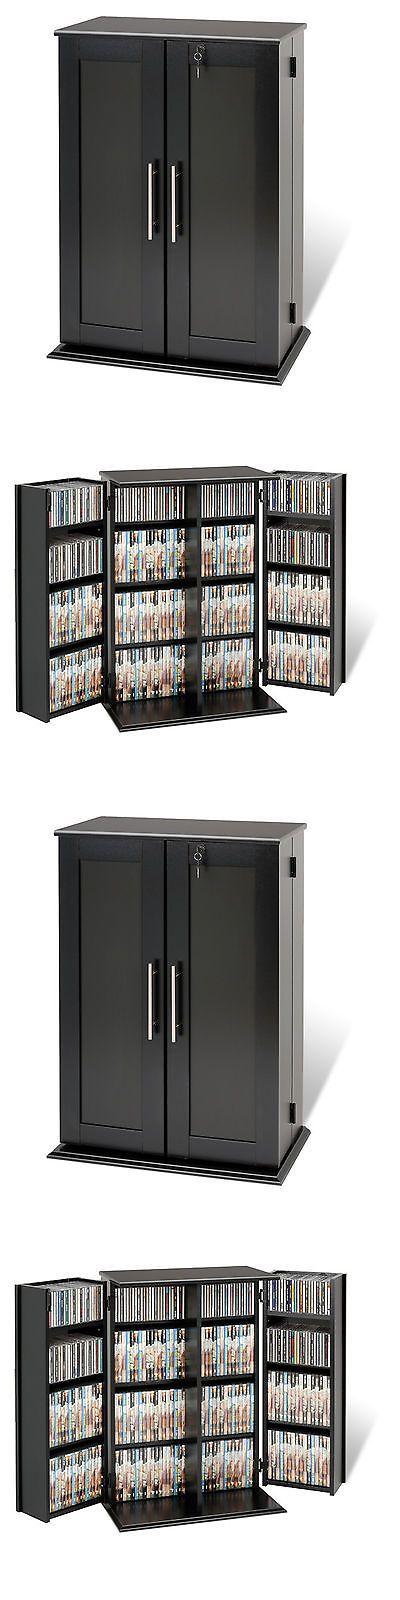 CD and Video Racks 22653: Black Multimedia Storage Cabinet Cd Dvd Rack Tower Video Media Shelf Organizer -> BUY IT NOW ONLY: $174.95 on eBay!